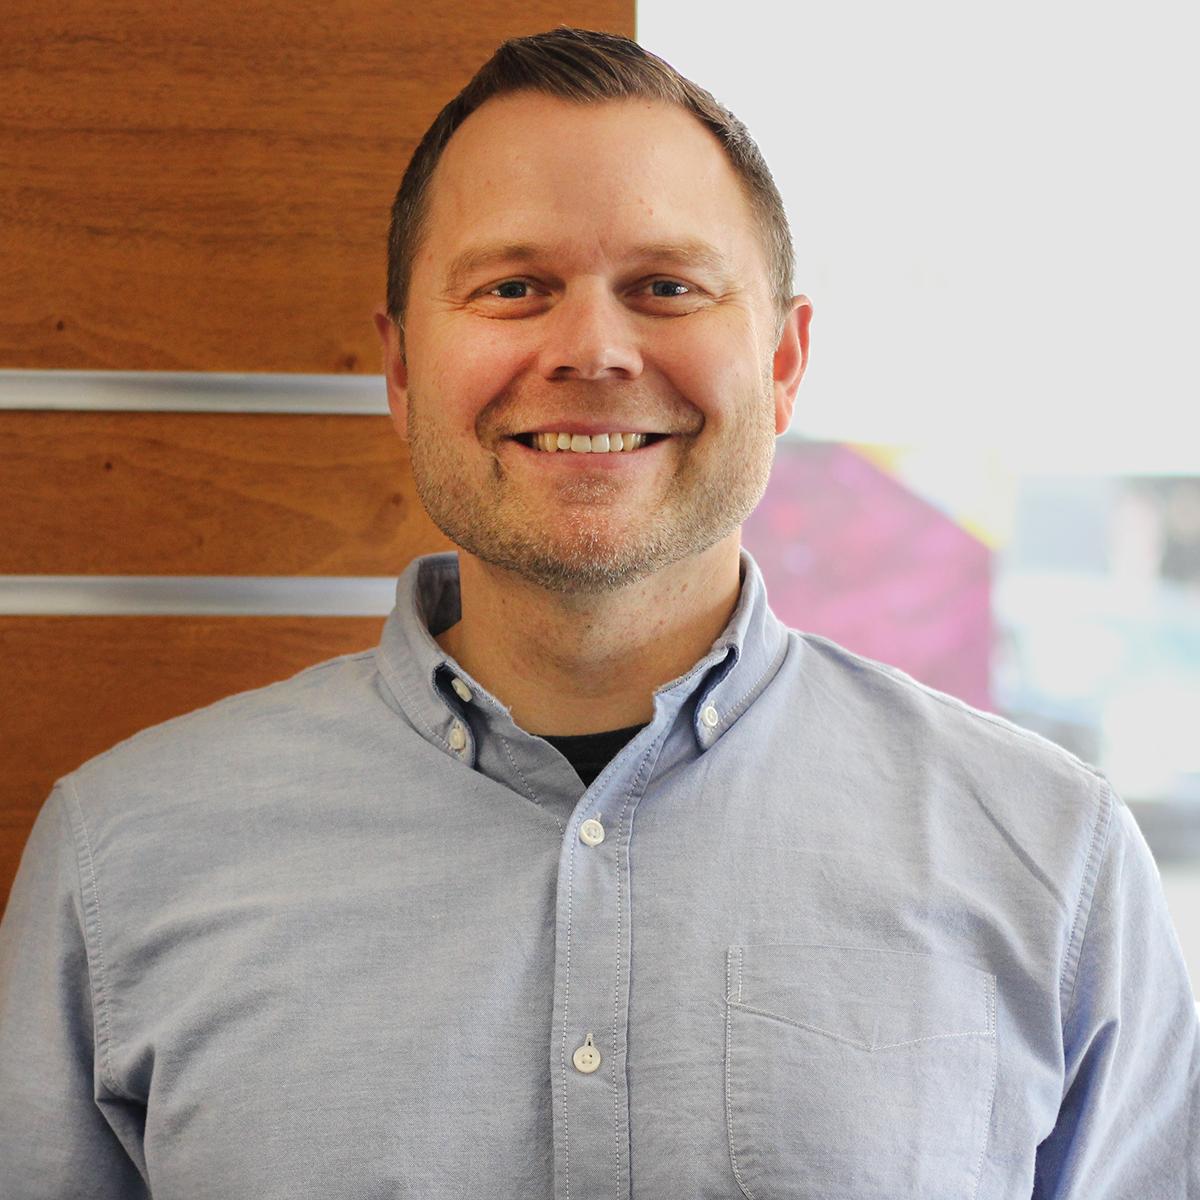 Jon Slayden - Lead PastorJon@hccmidland.com